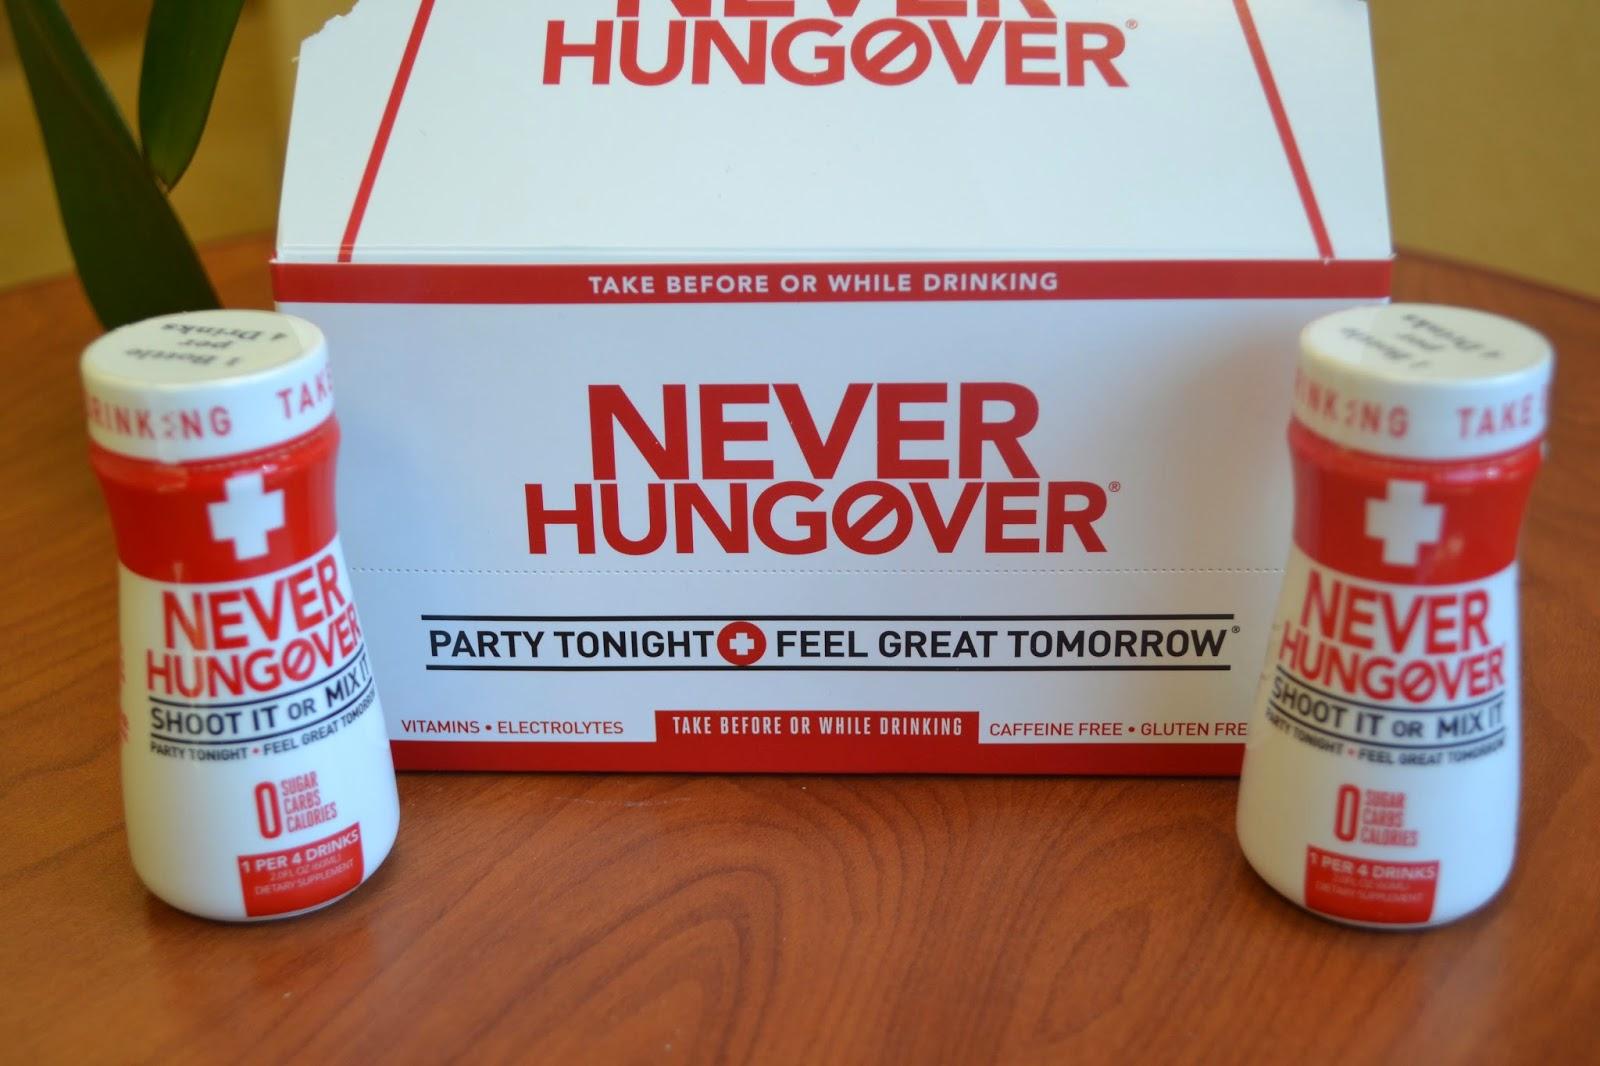 Coupon Savvy Sarah: Never Hungover Product Review